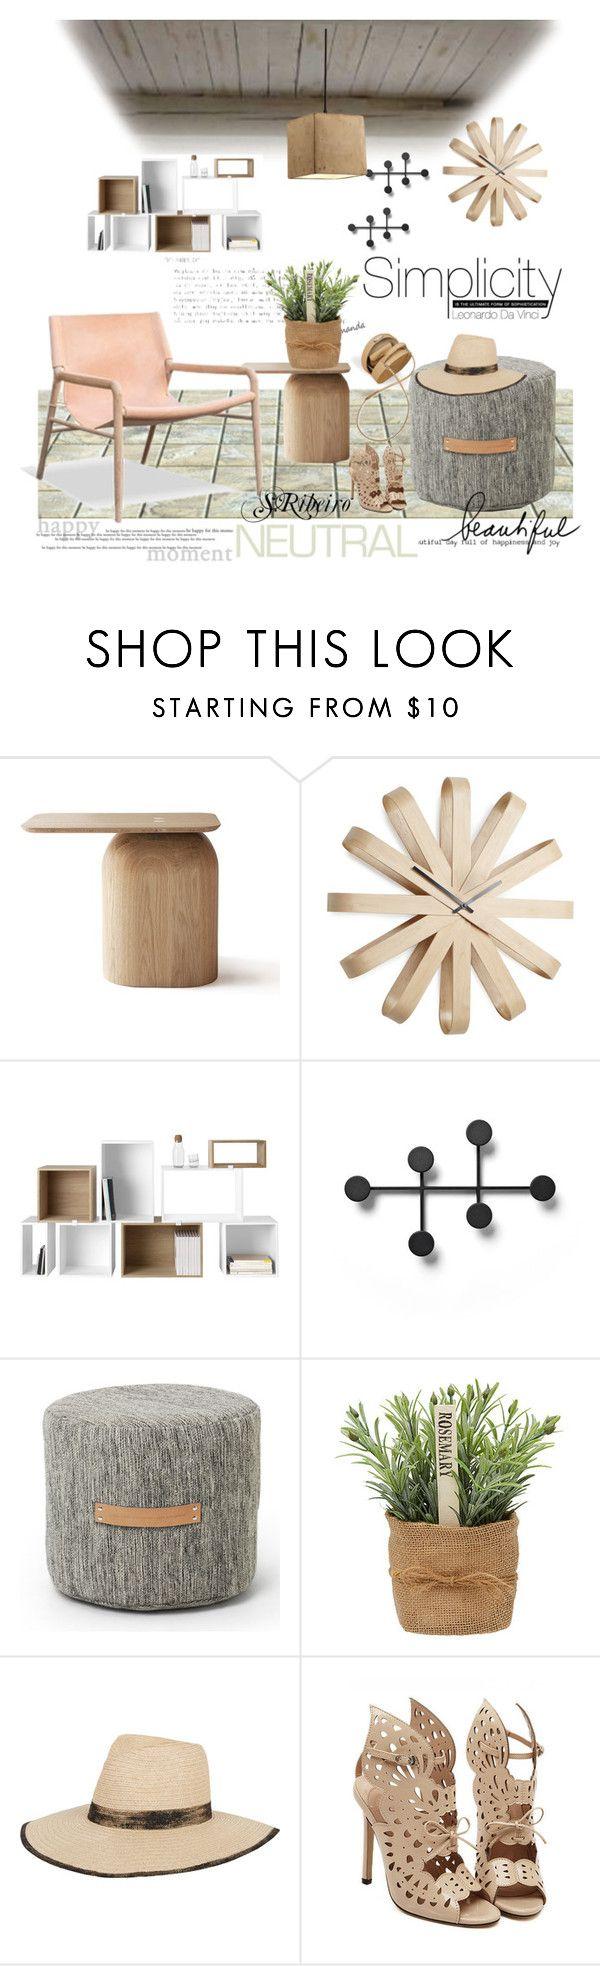 """Untitled #3254"" by sribeiro on Polyvore featuring interior, interiors, interior design, home, home decor, interior decorating, Umbra, Muuto, Menu and Design House Stockholm"